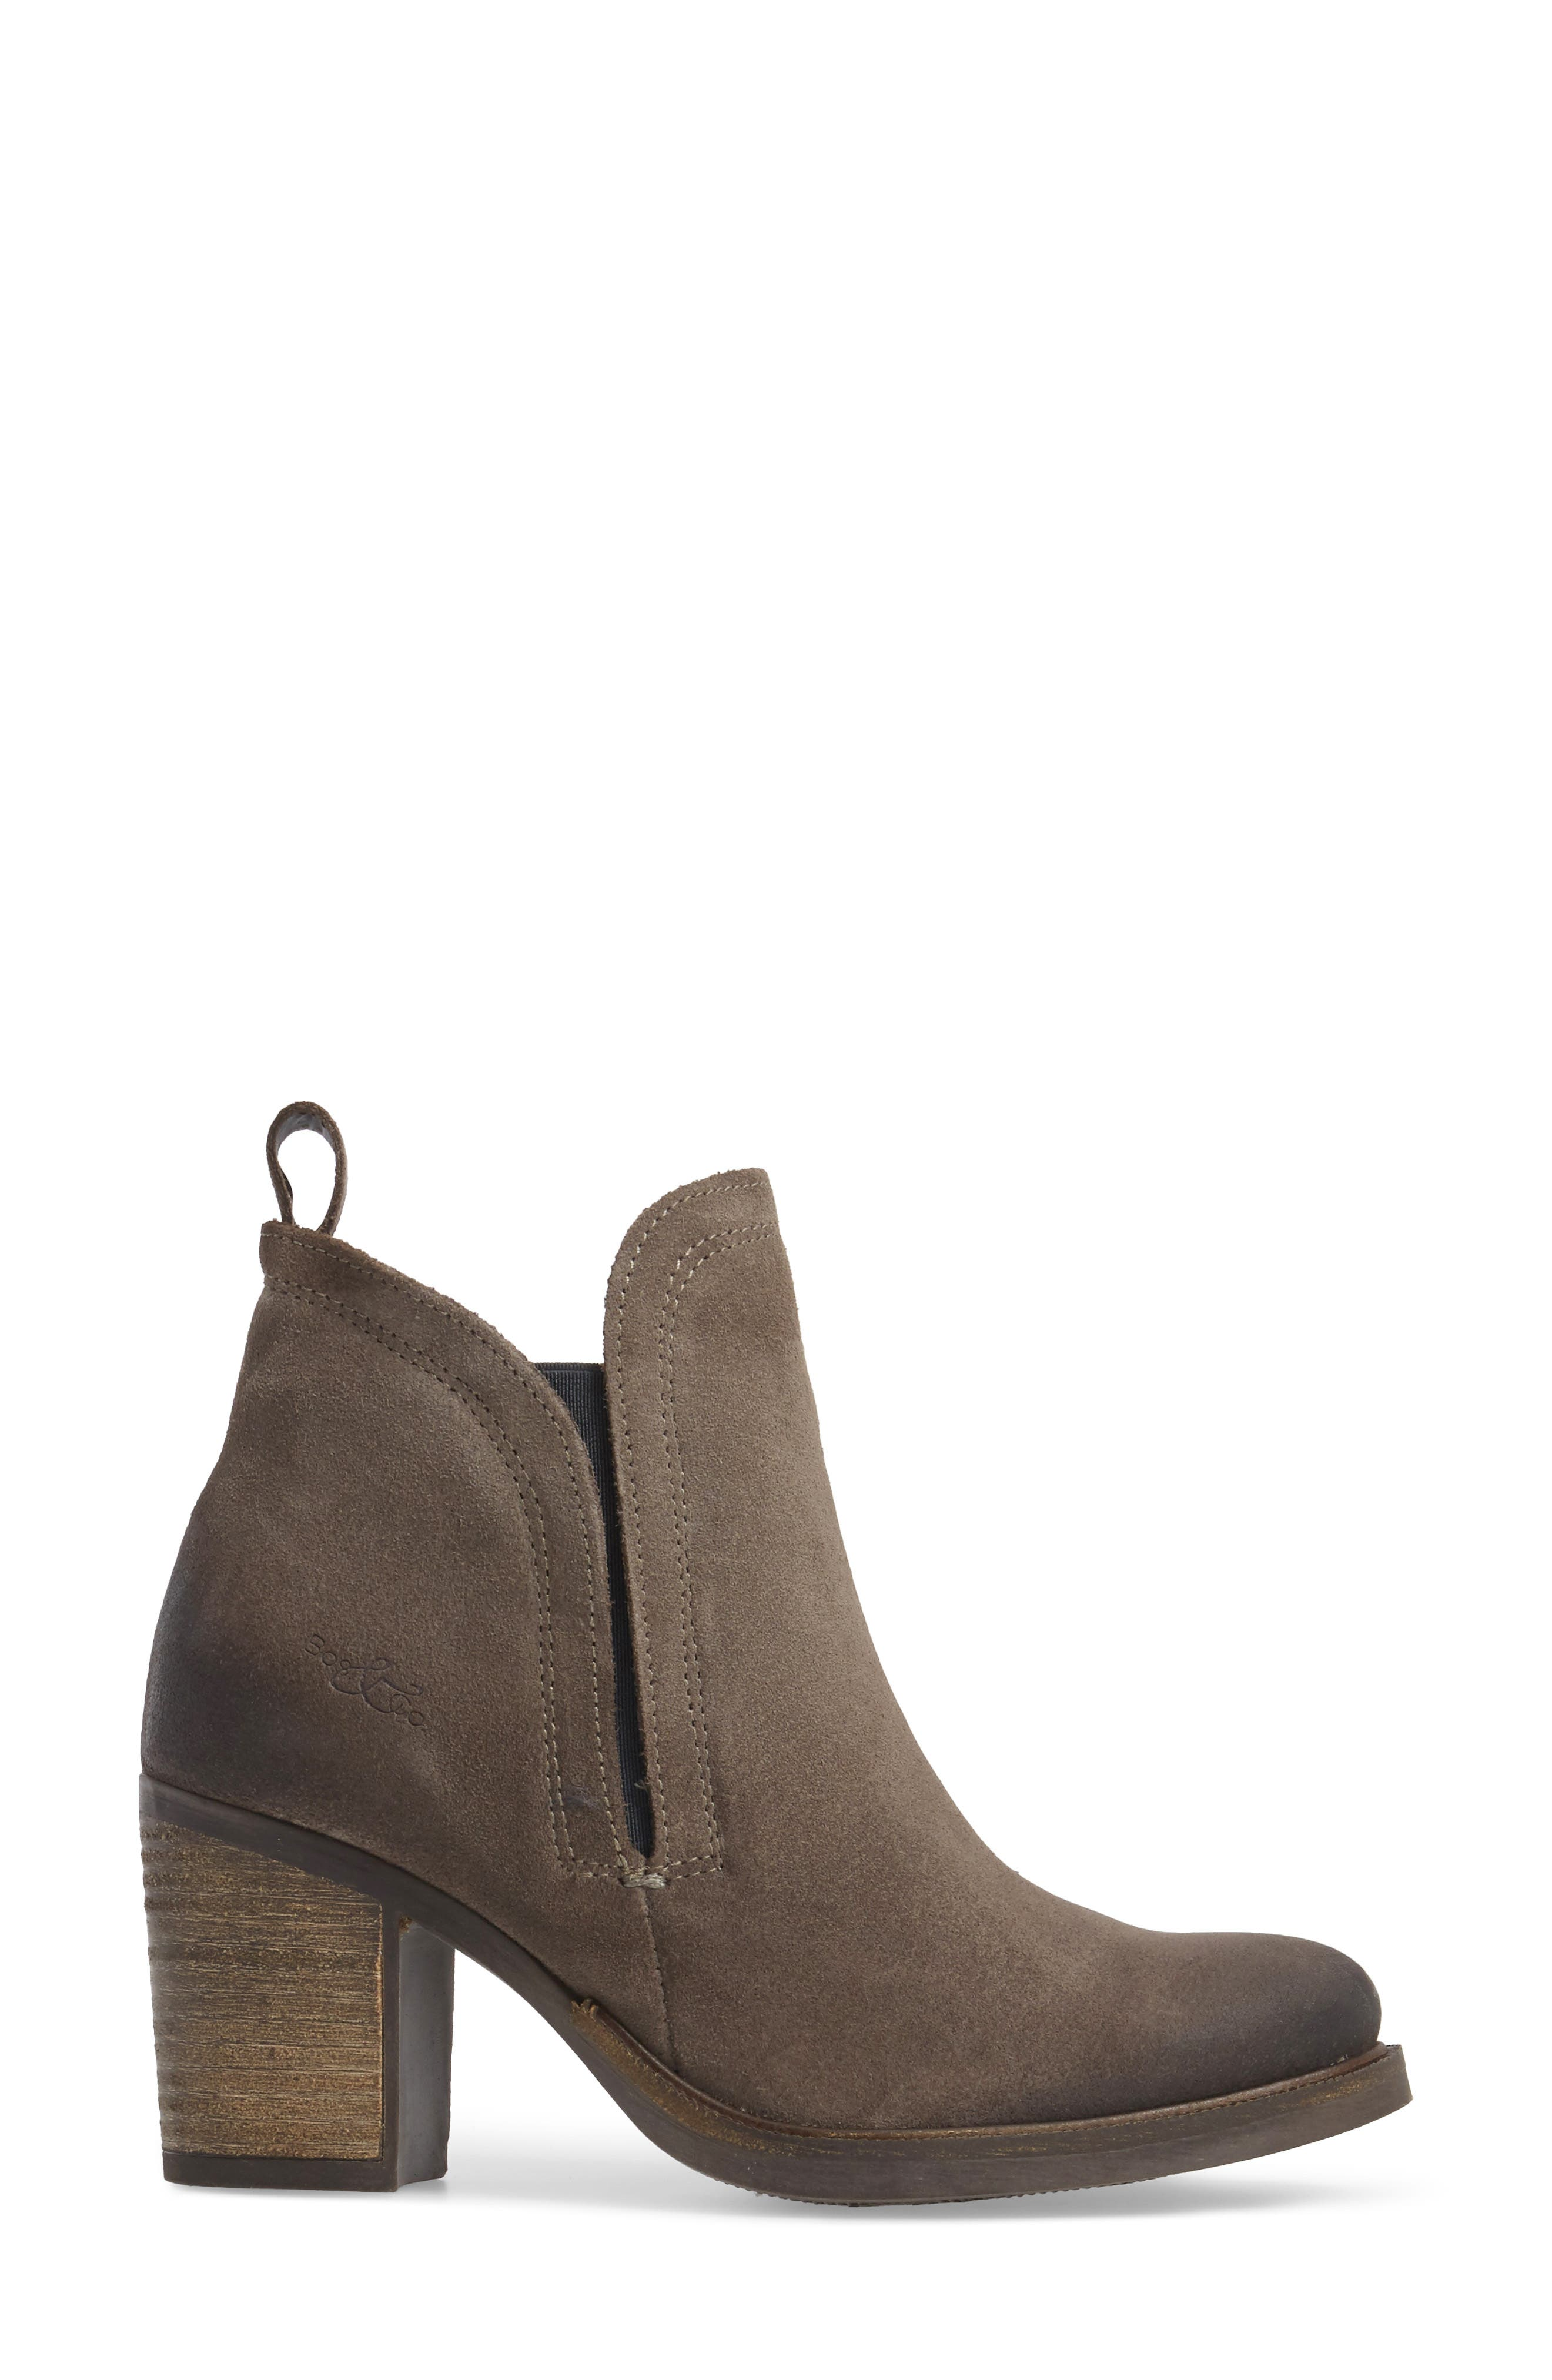 'Belfield' Waterproof Chelsea Boot,                             Alternate thumbnail 3, color,                             Grey Suede